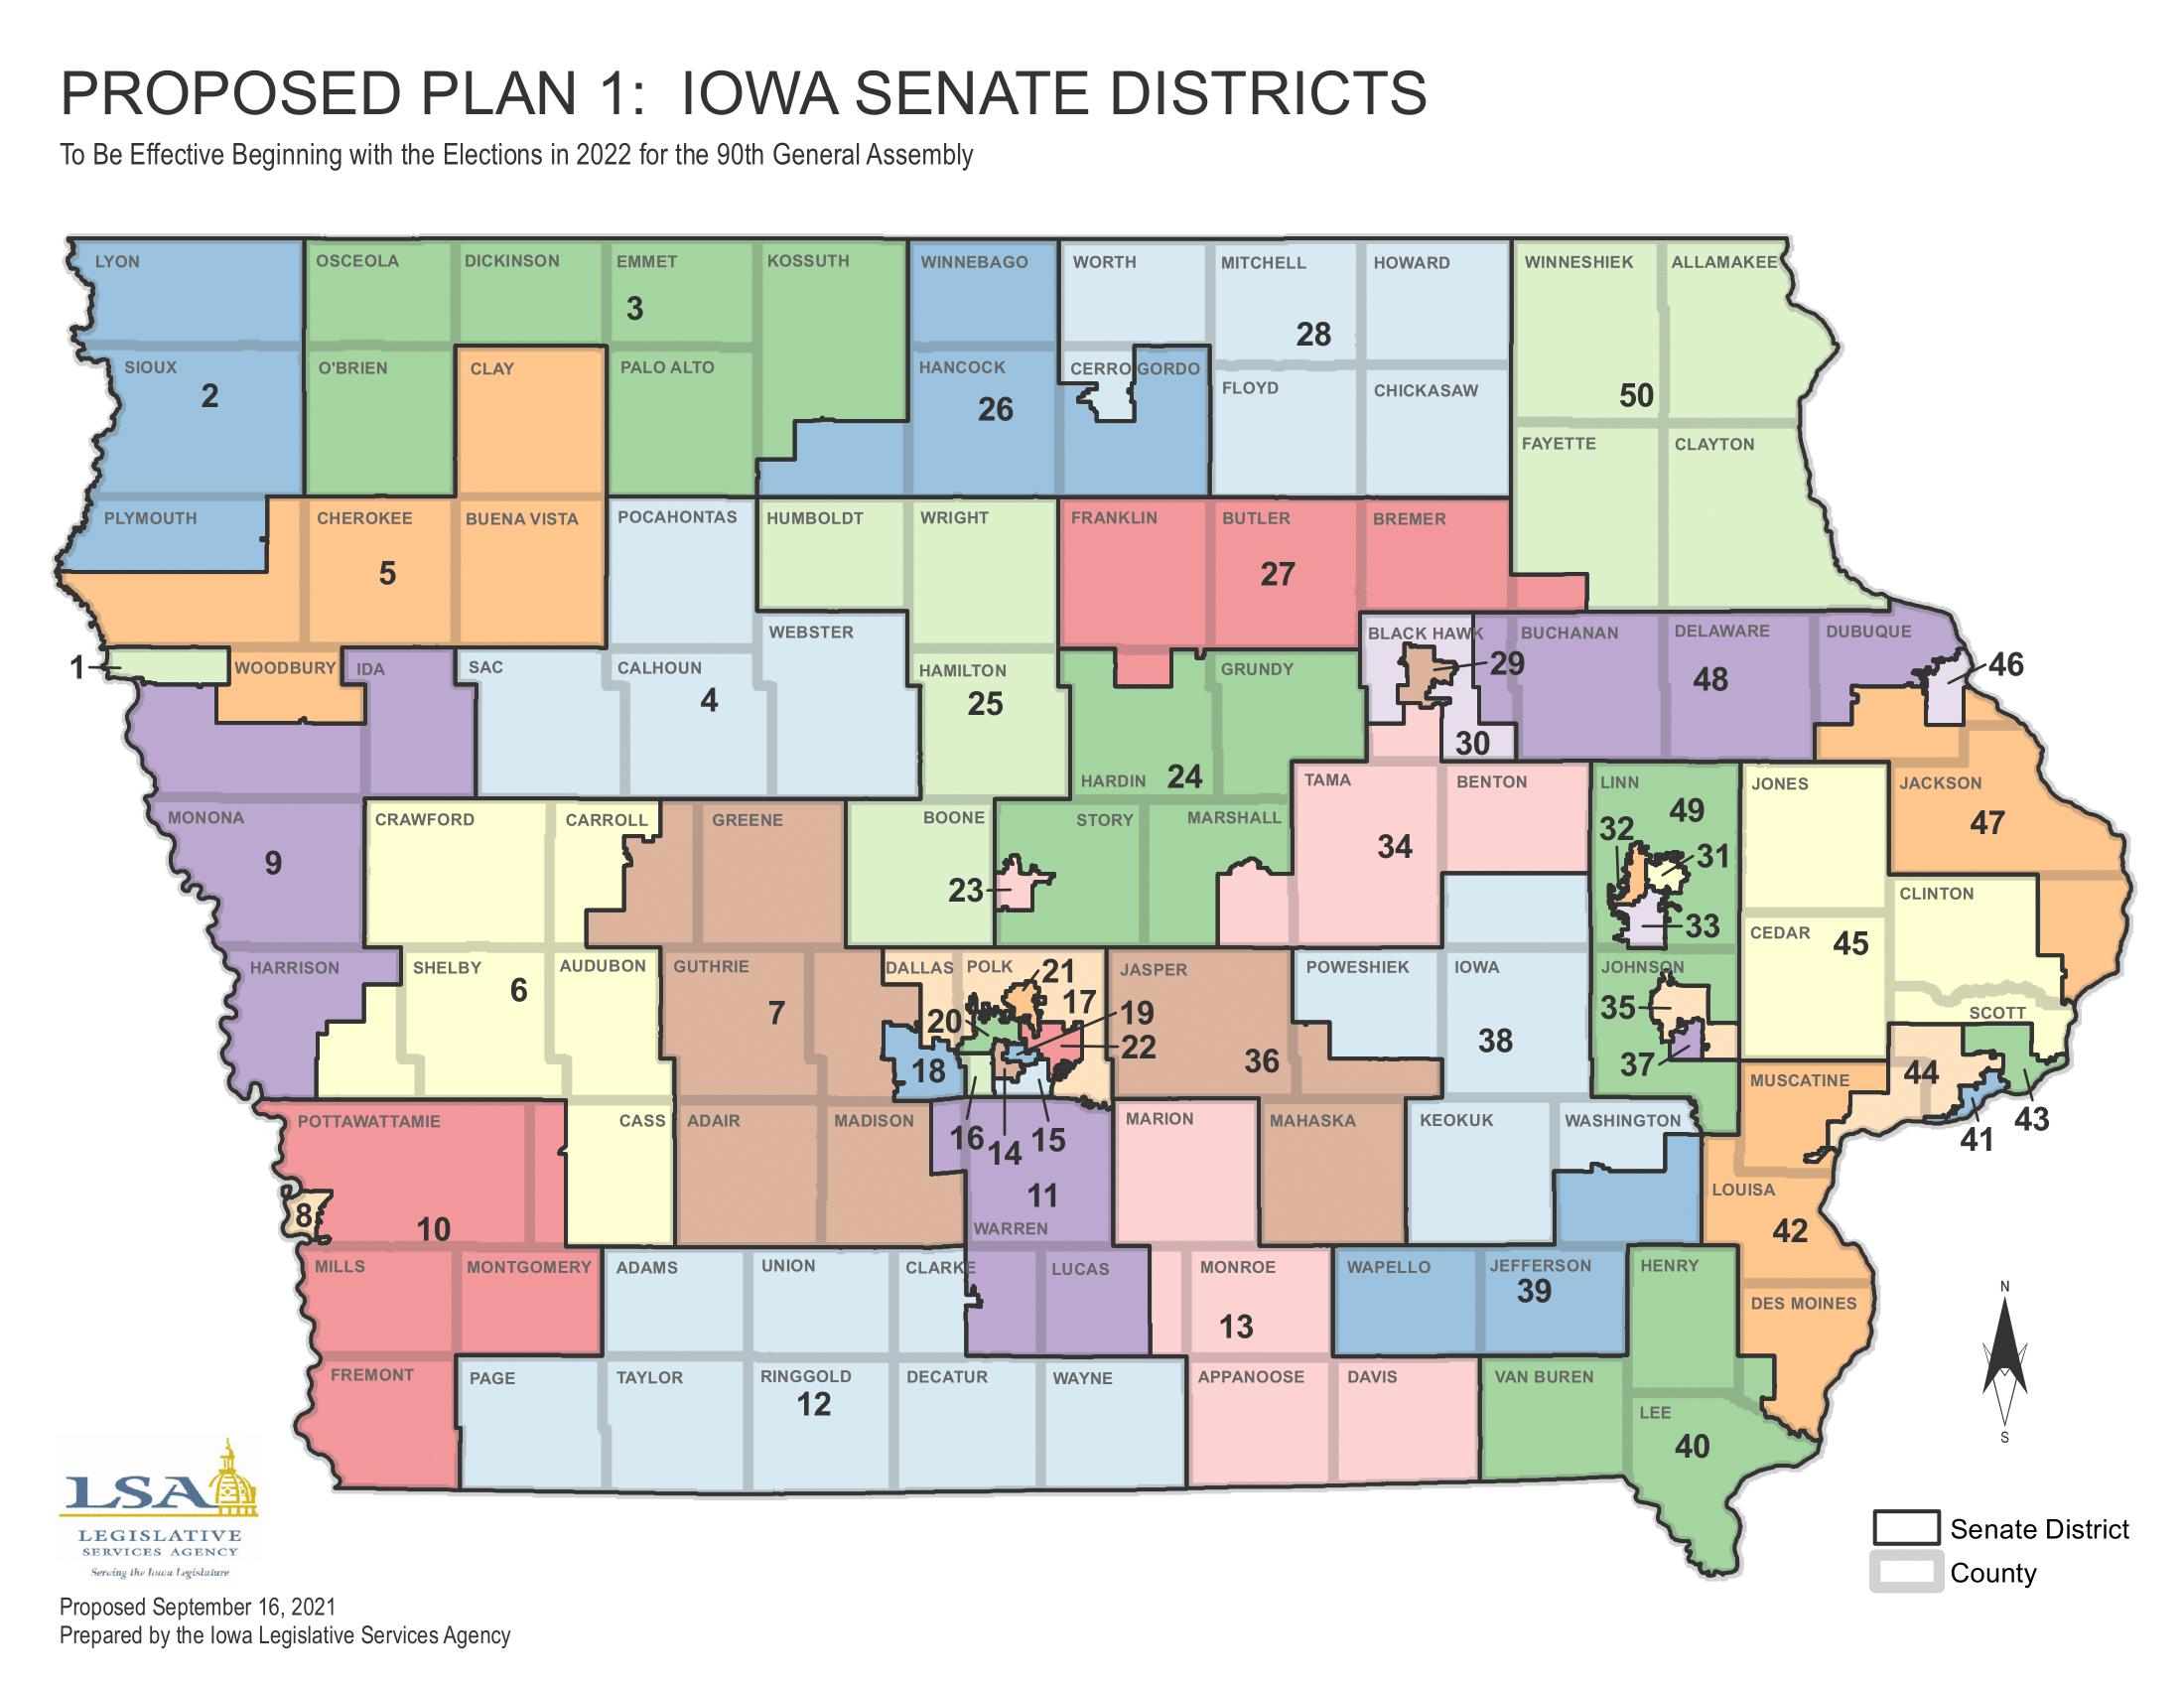 Iowa redistricting 2020 proposed Senate districts map